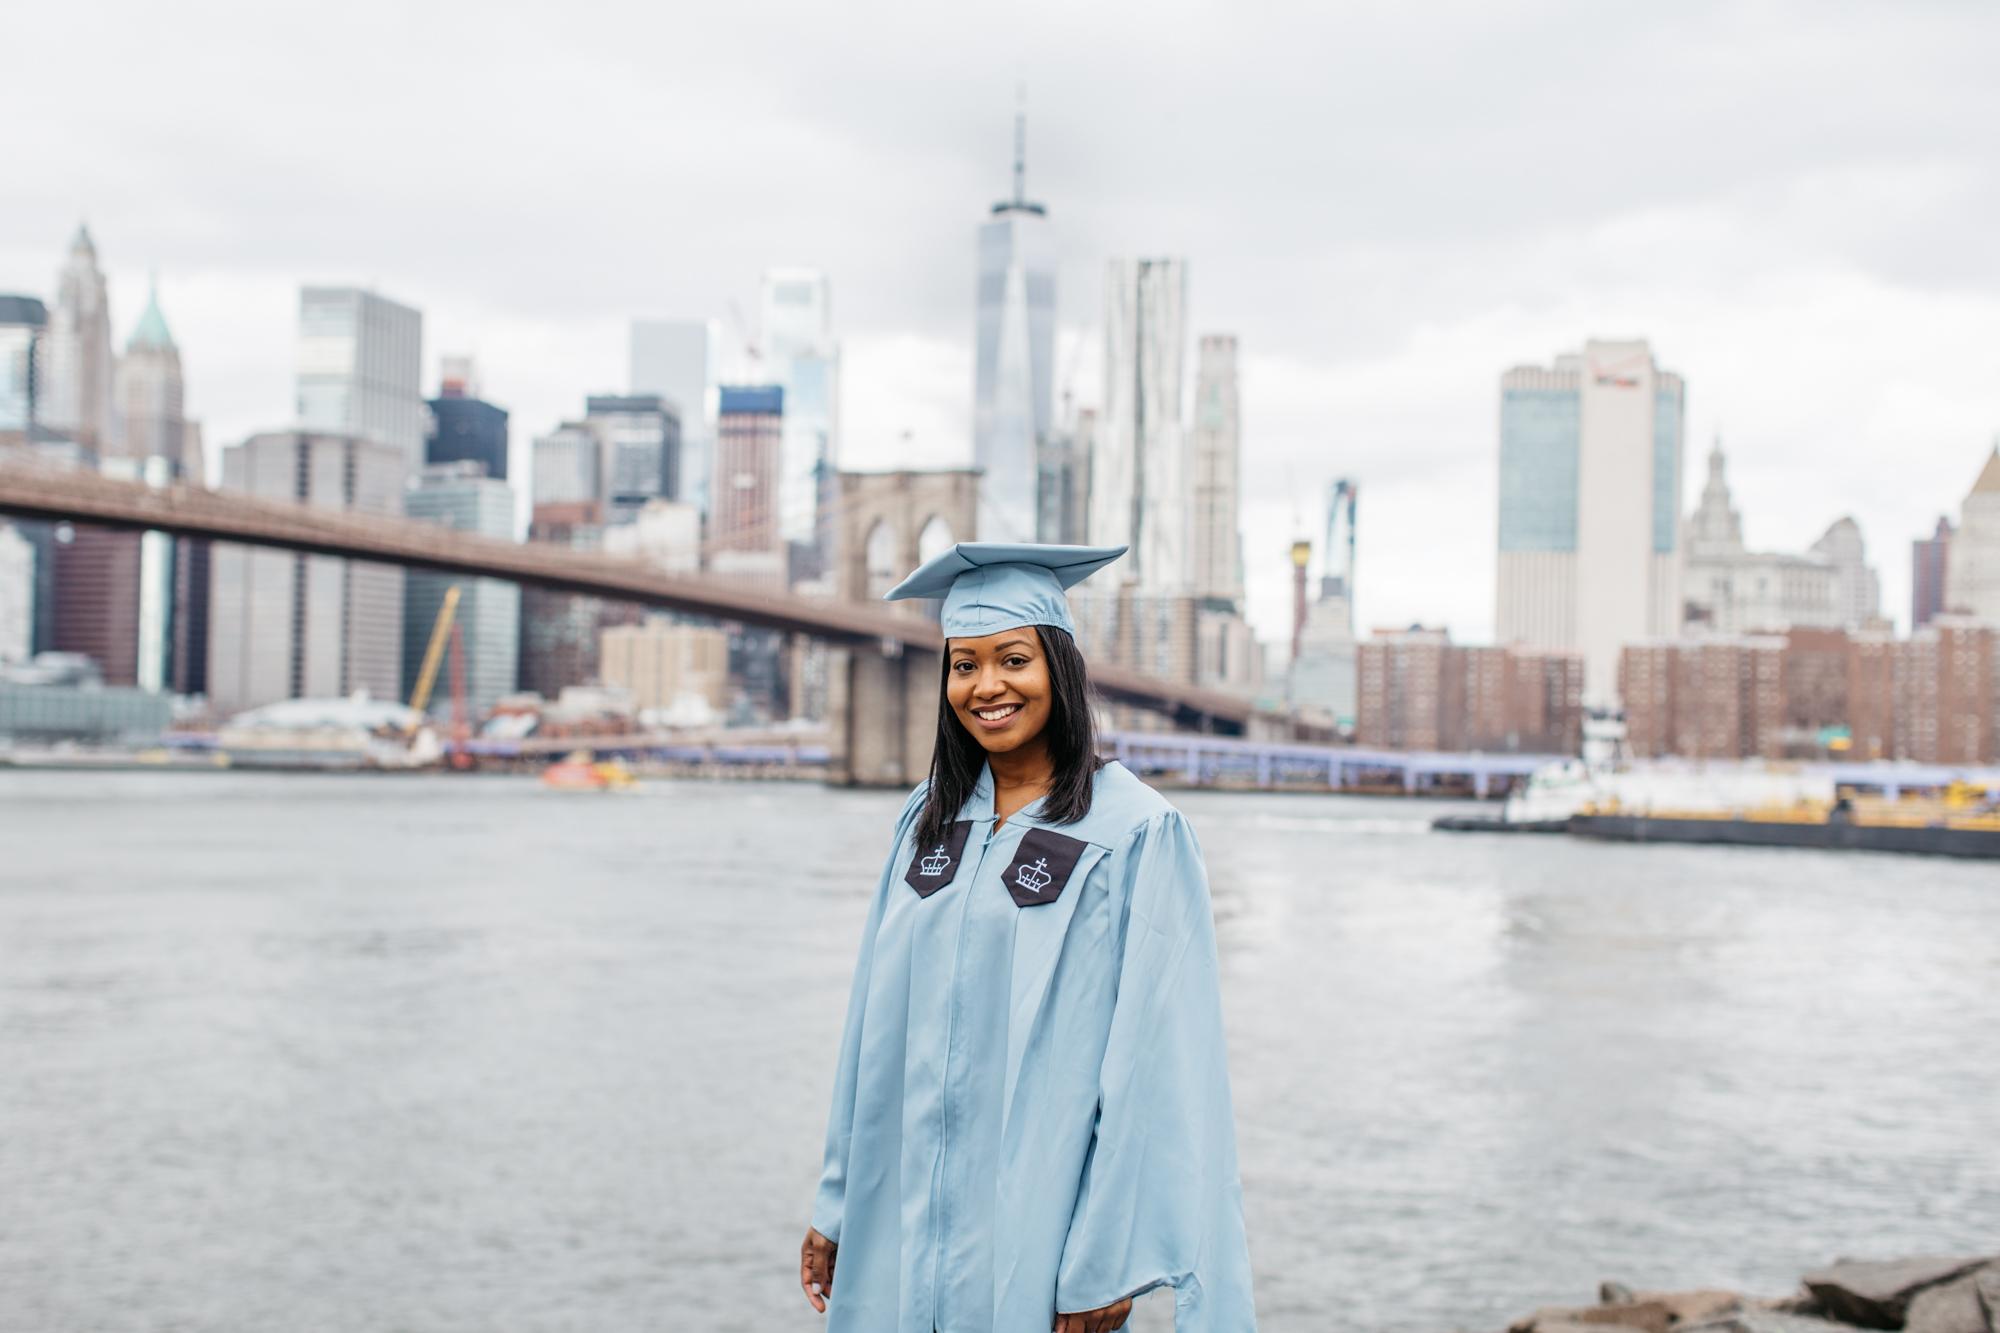 Courtney_Graduation_Photographer_Colombia_MBA_Student_DUMBO_portrait_NYC_Brooklyn-26.jpg